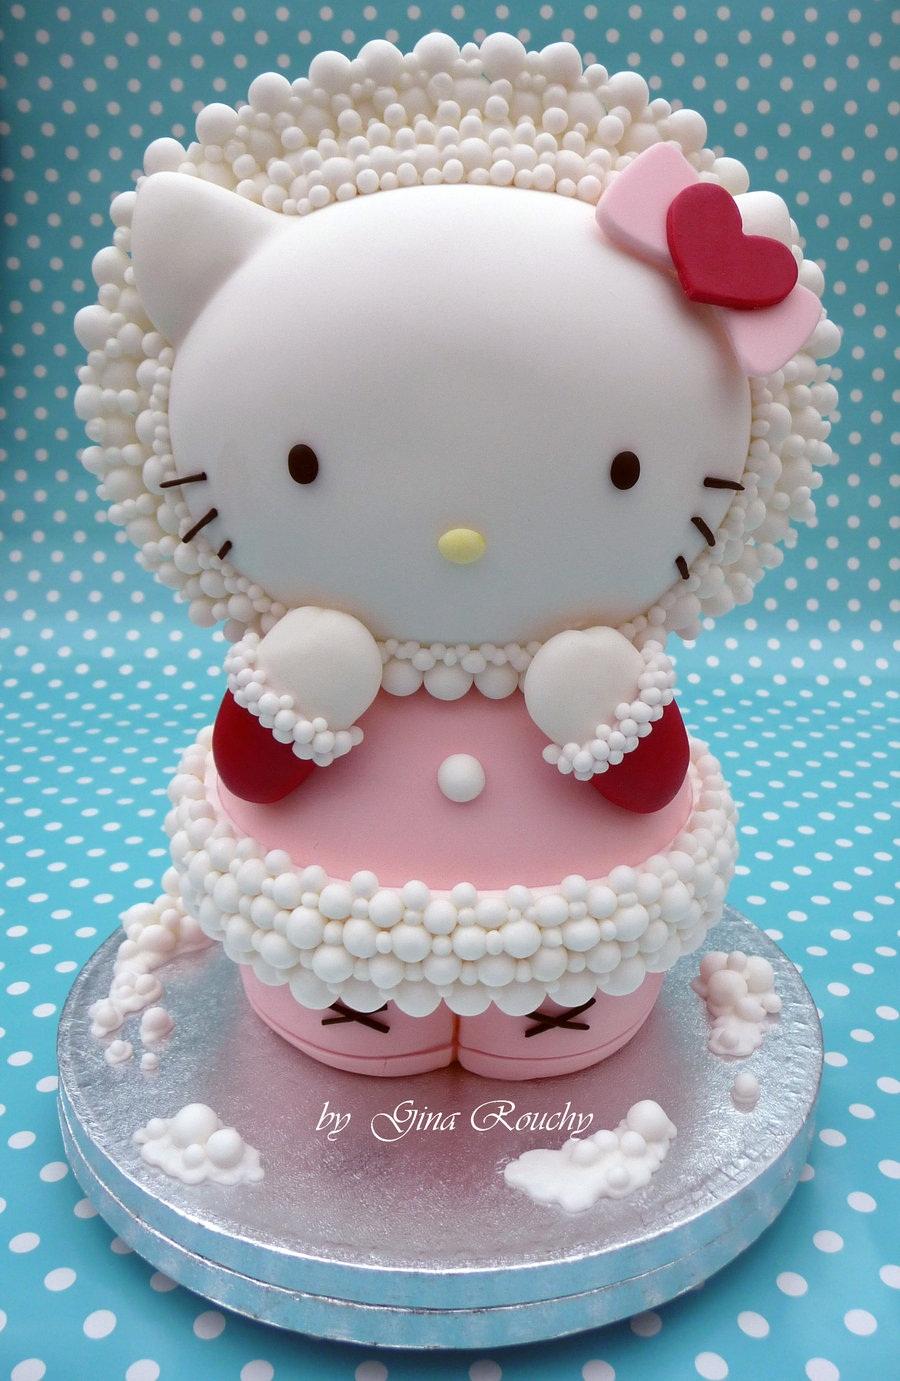 Swell Hello Kitty Cakes Decoration Ideas Little Birthday Cakes Funny Birthday Cards Online Alyptdamsfinfo